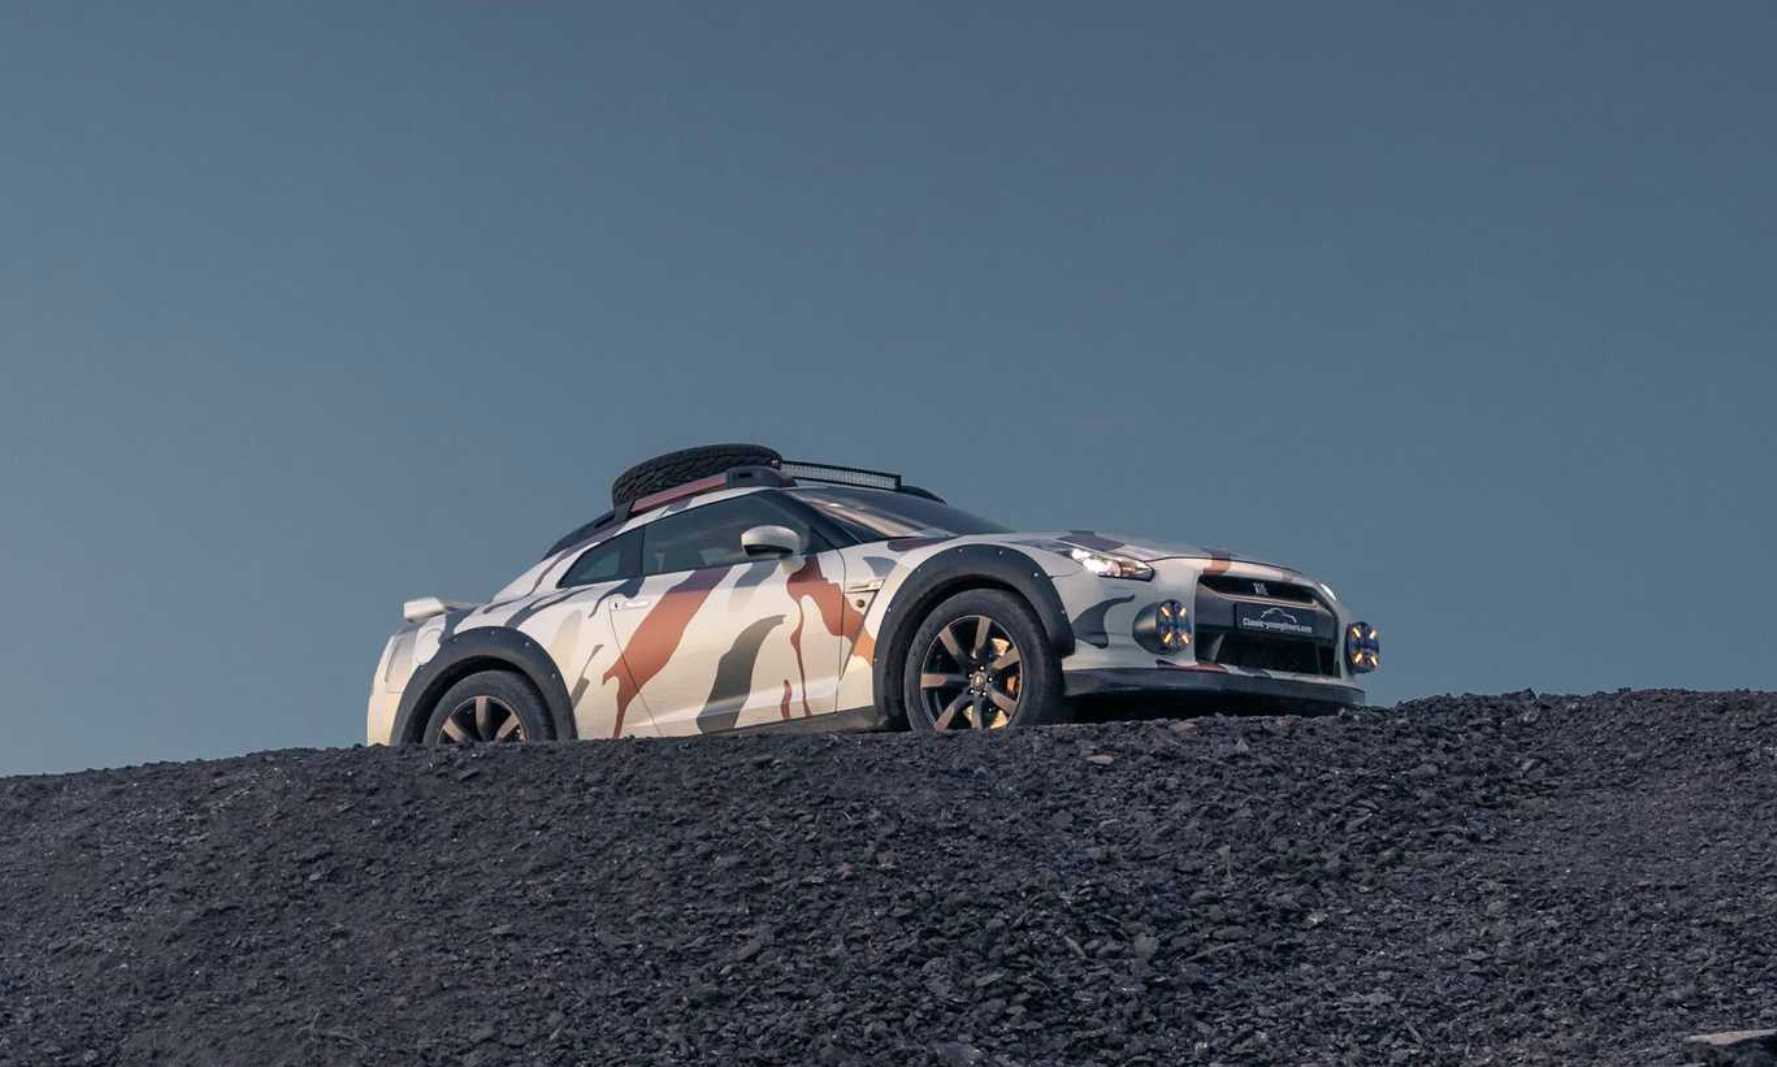 Nissan GT-R Off-Roader hillside